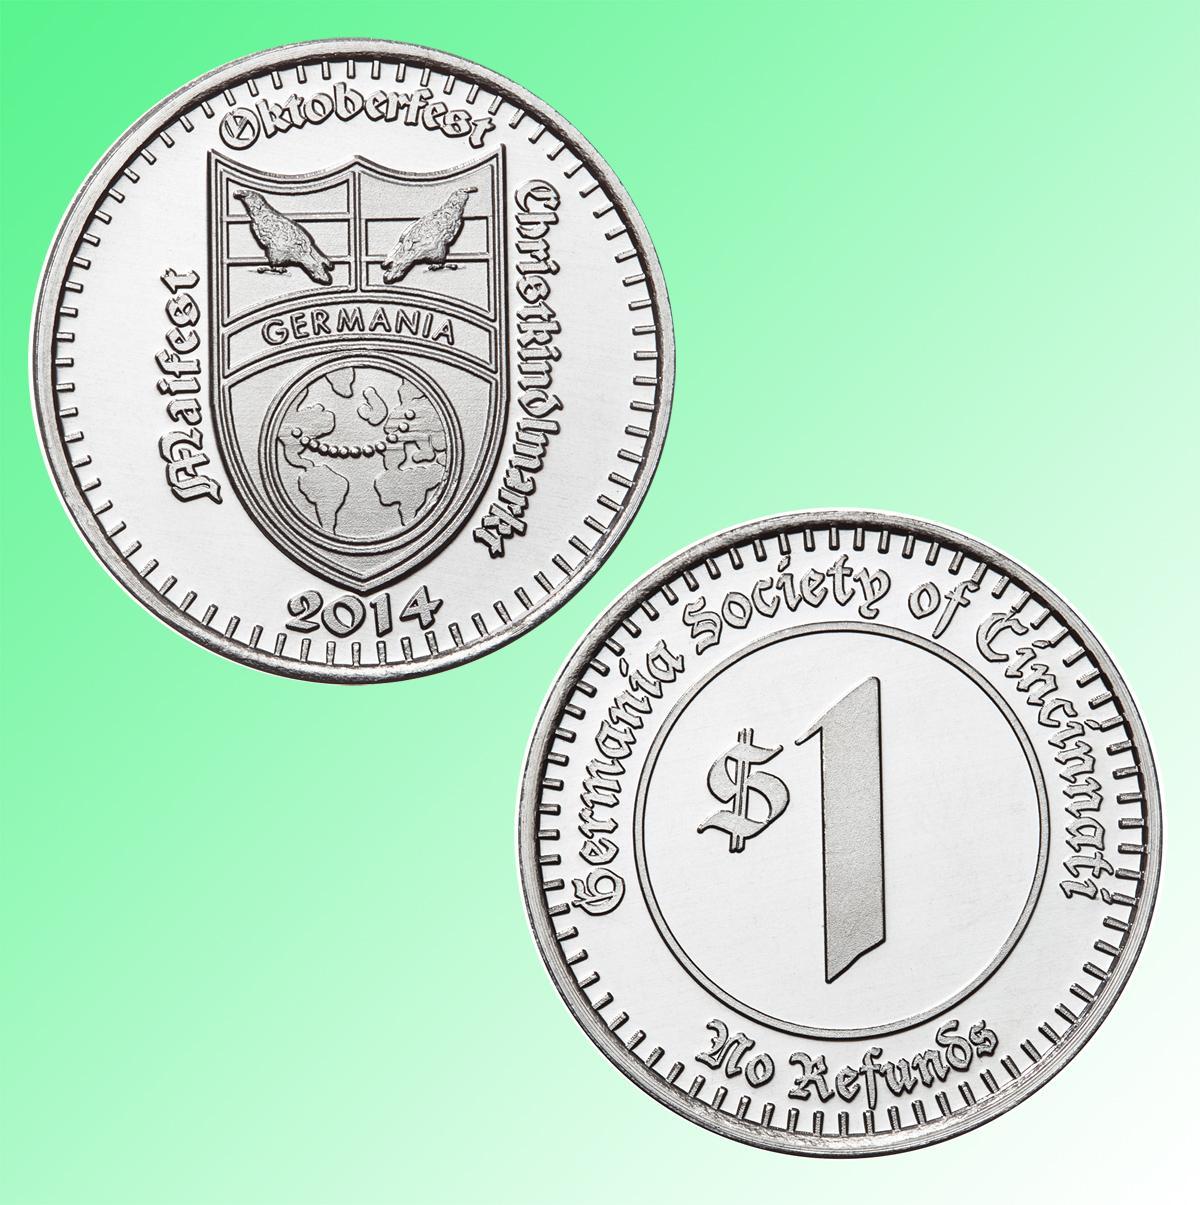 Germania Oktoberfest custom aluminum tokens